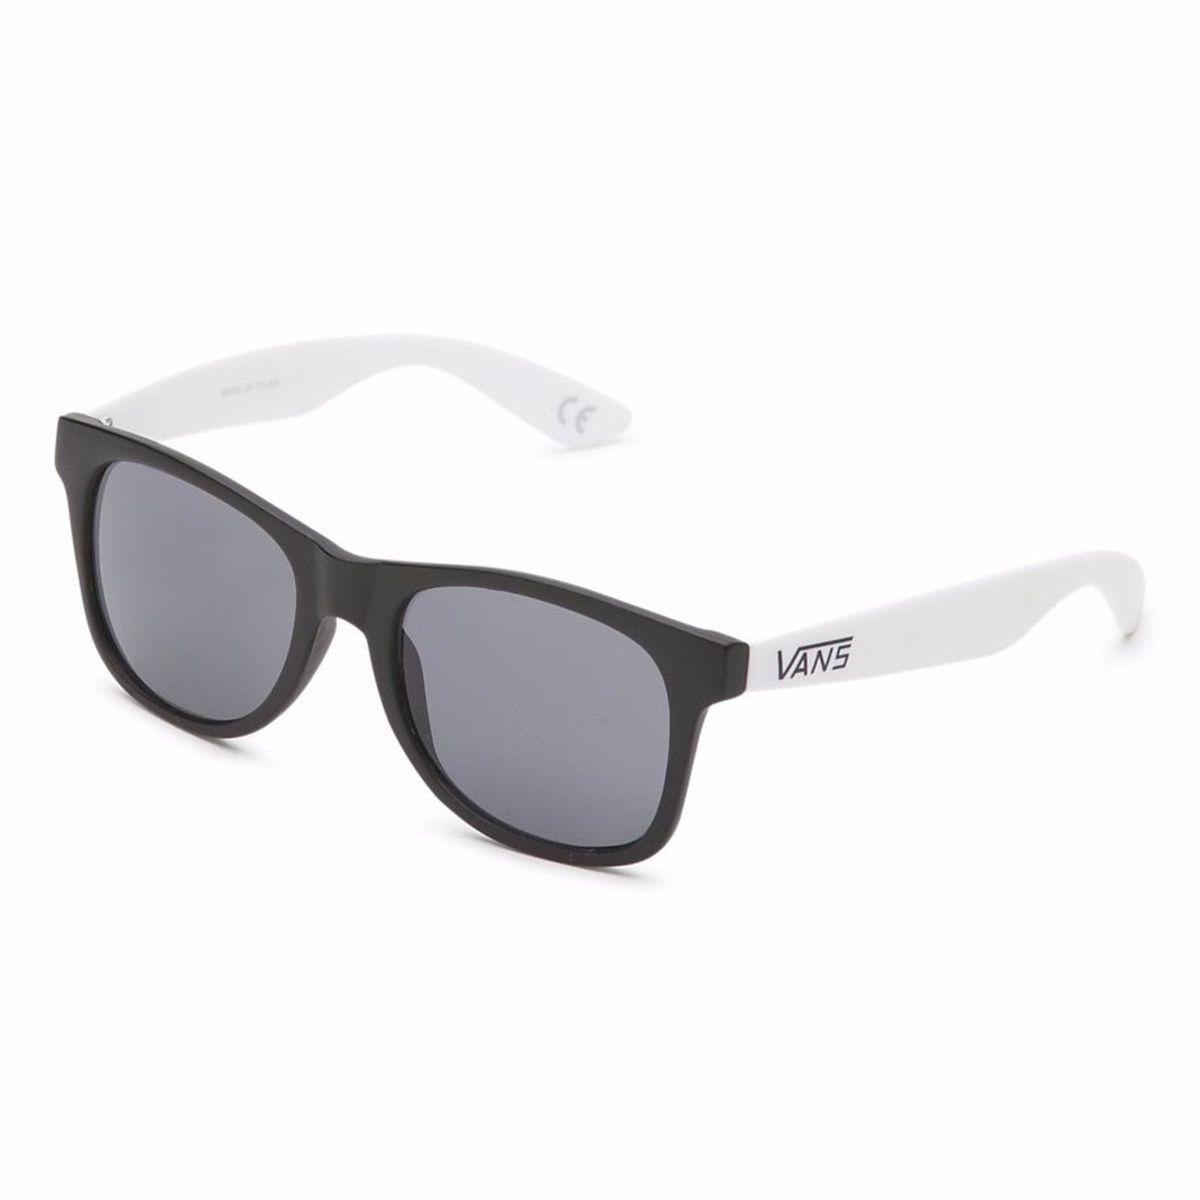 141b7775abc23 Óculos Vans Spicoli Wayfarer Original